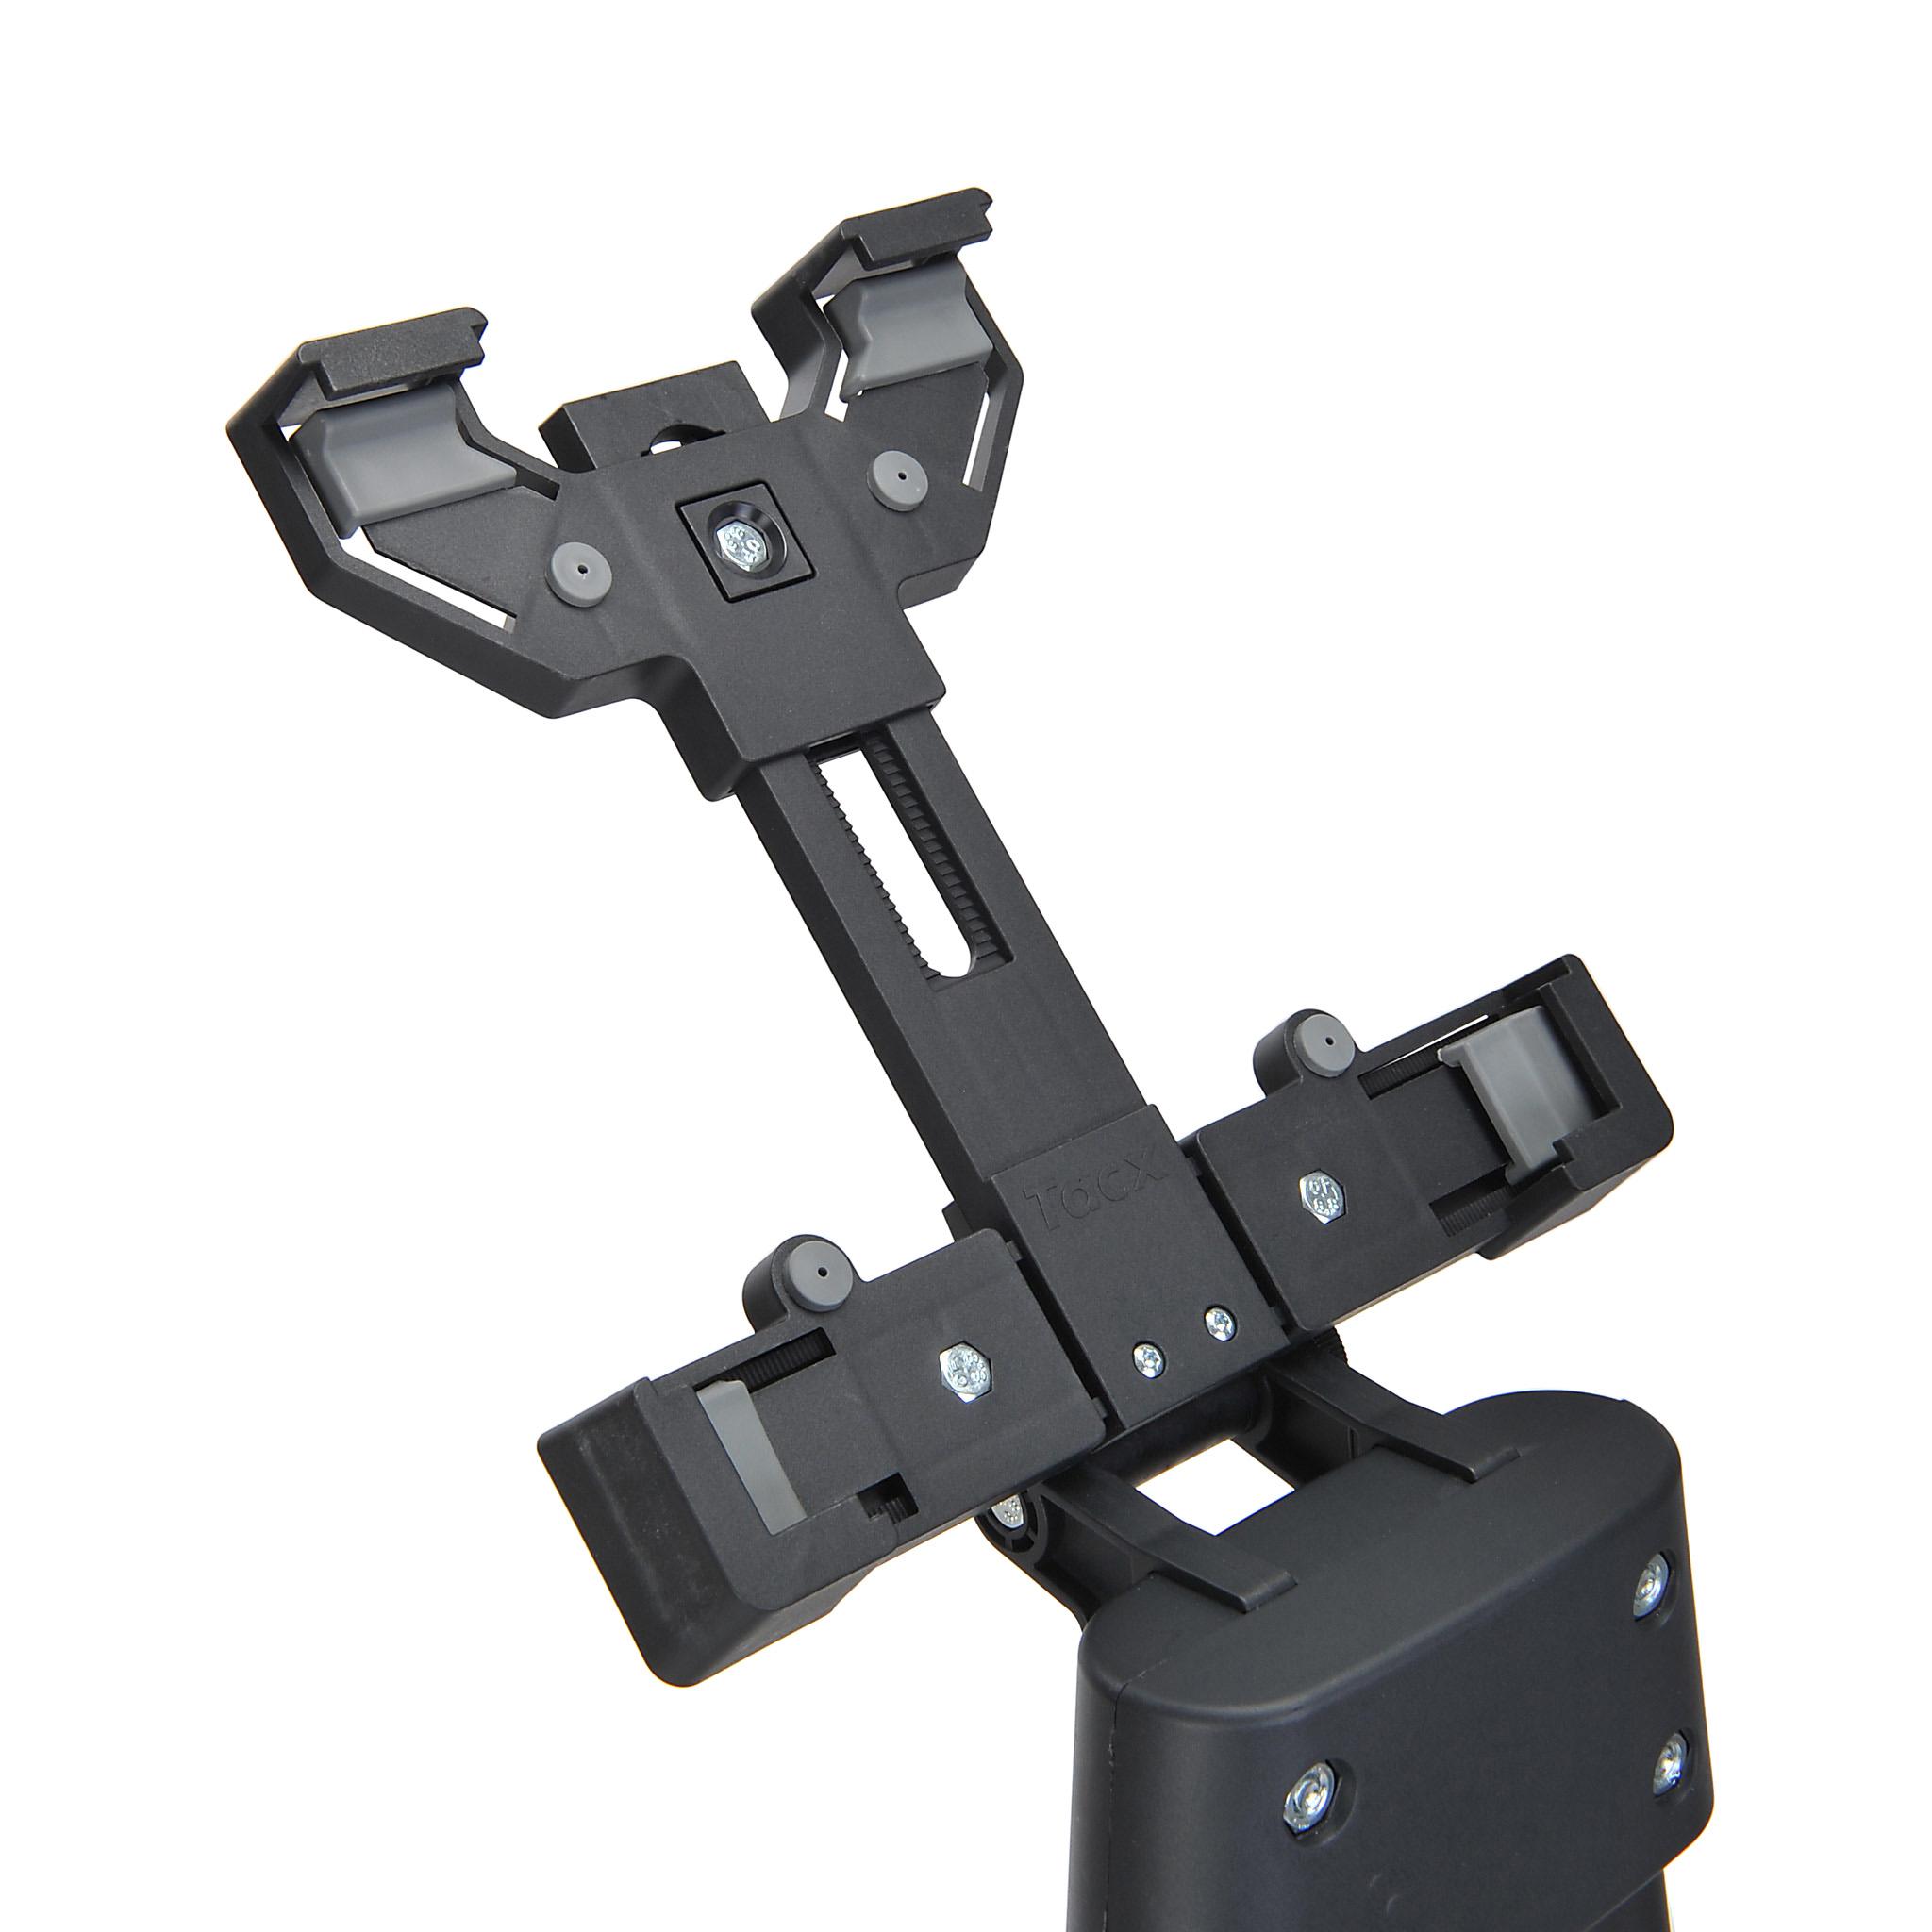 support pied pour tablette pour home trainer tacx t2098 probikeshop. Black Bedroom Furniture Sets. Home Design Ideas